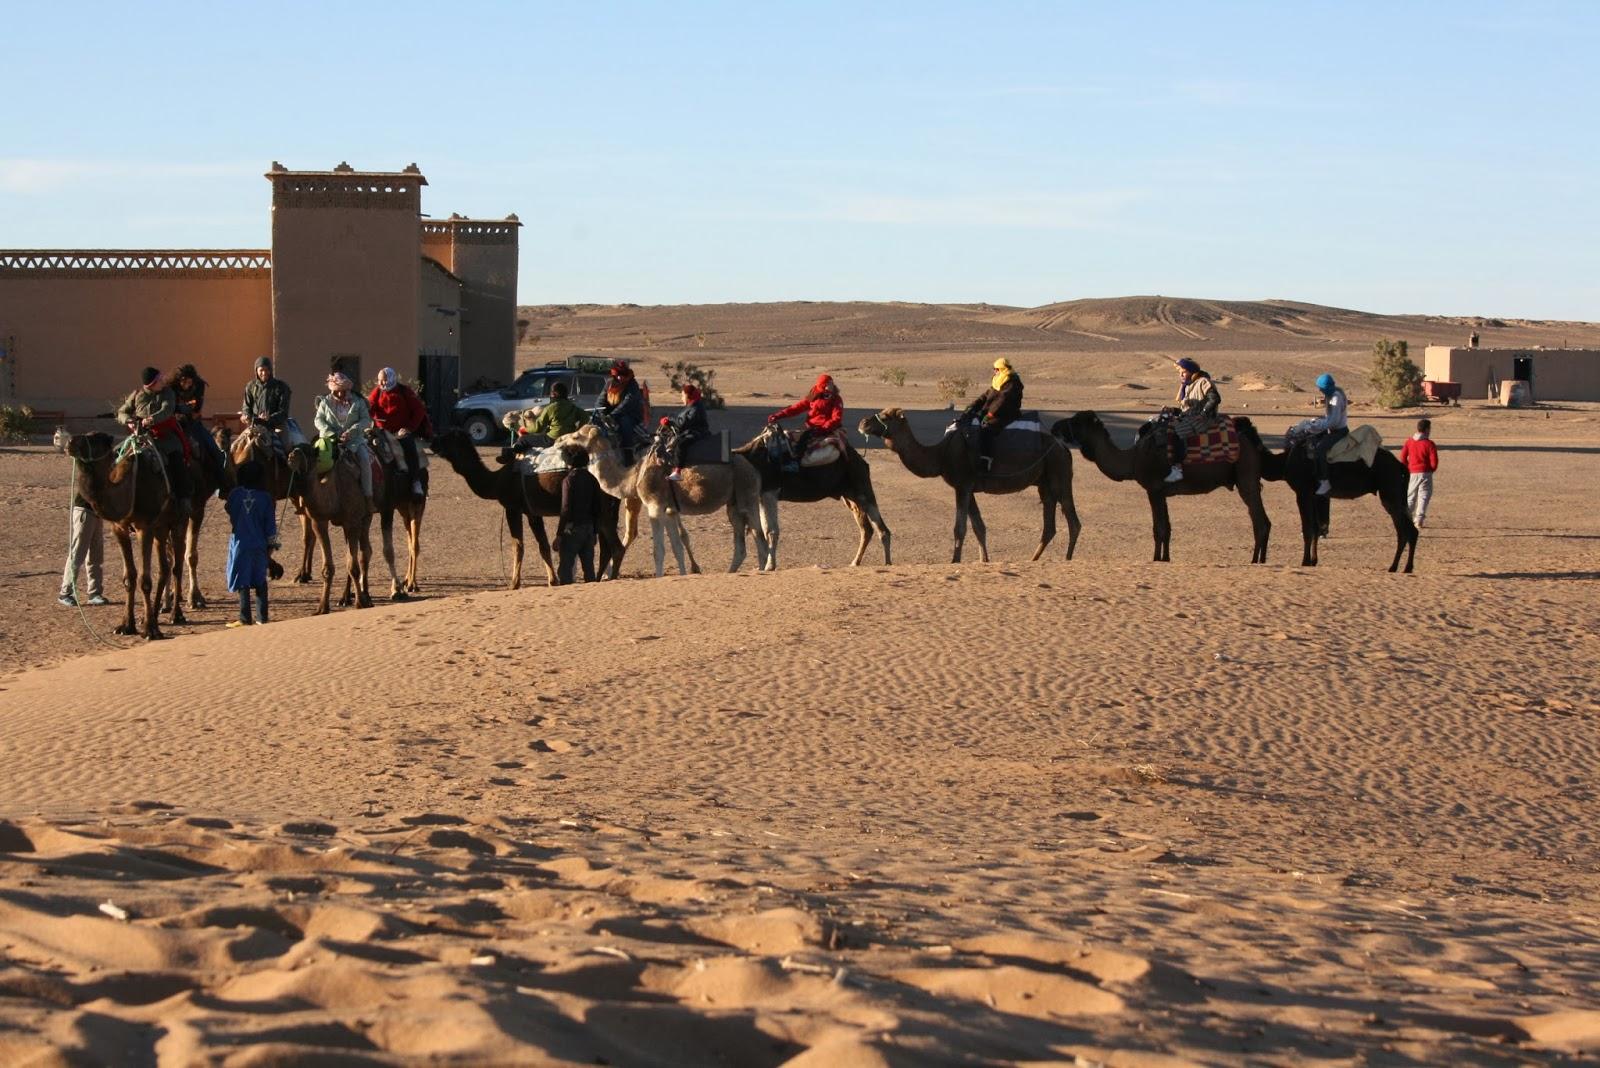 desierto de marruecos,semana santa, marrakech, erfoud, dunas de erg chebi